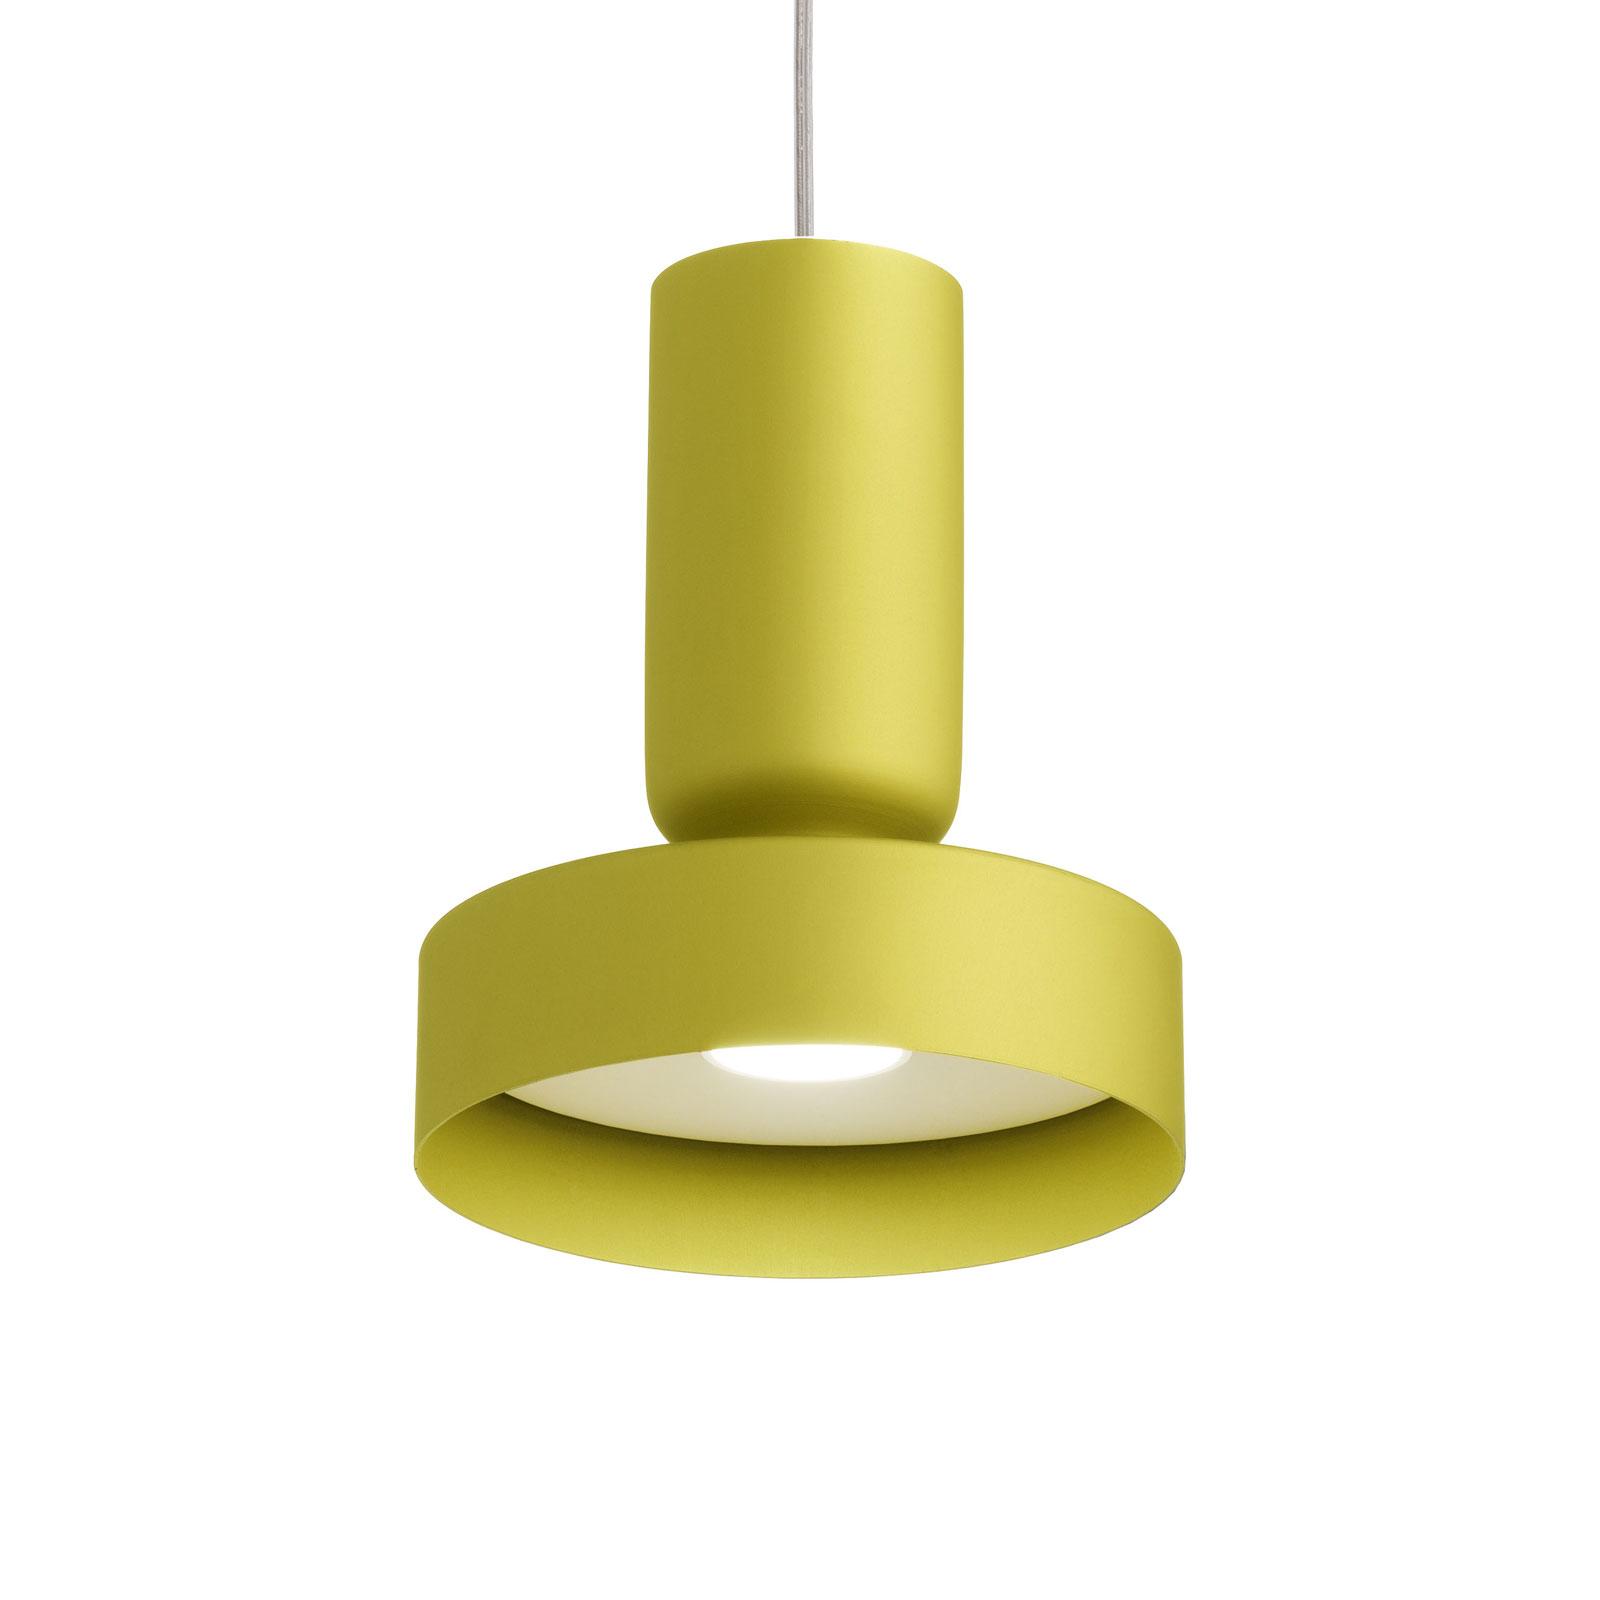 Modo Luce Hammer Hängelampe Ø 15 cm limone